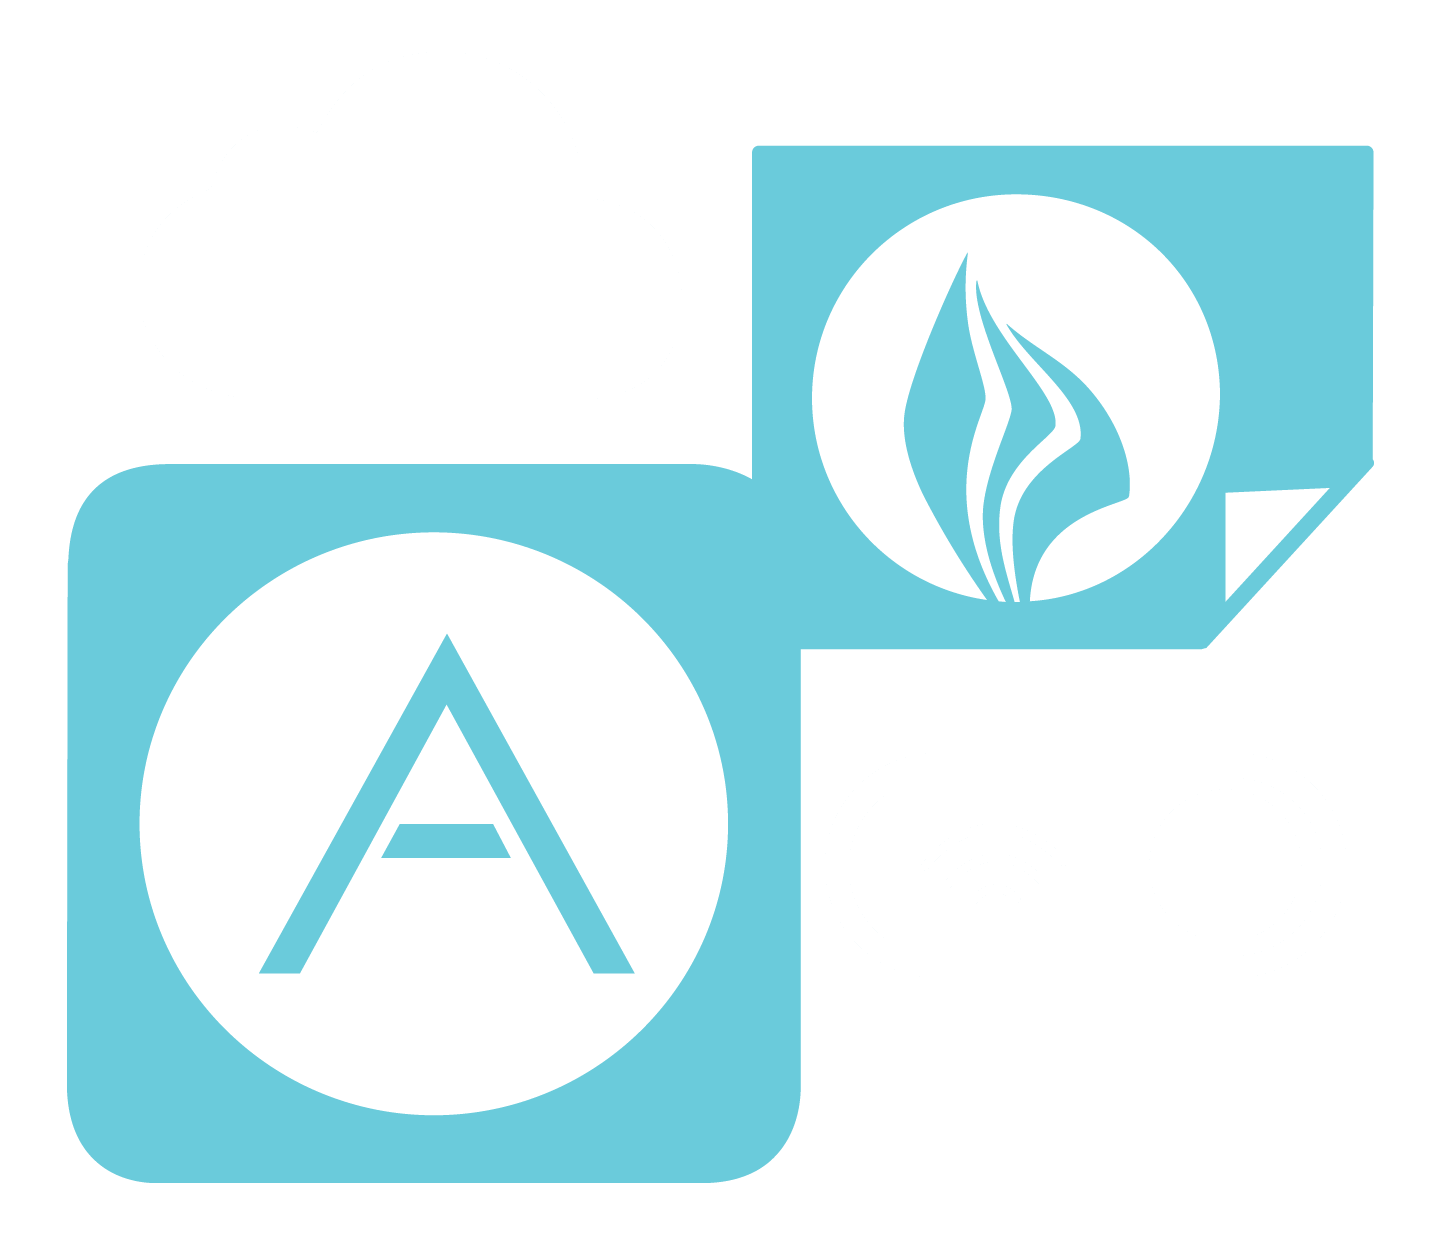 Oca enterprises clipart snowflake vector library library ActivPanel - Interactive Flat Panel Displays | Promethean vector library library